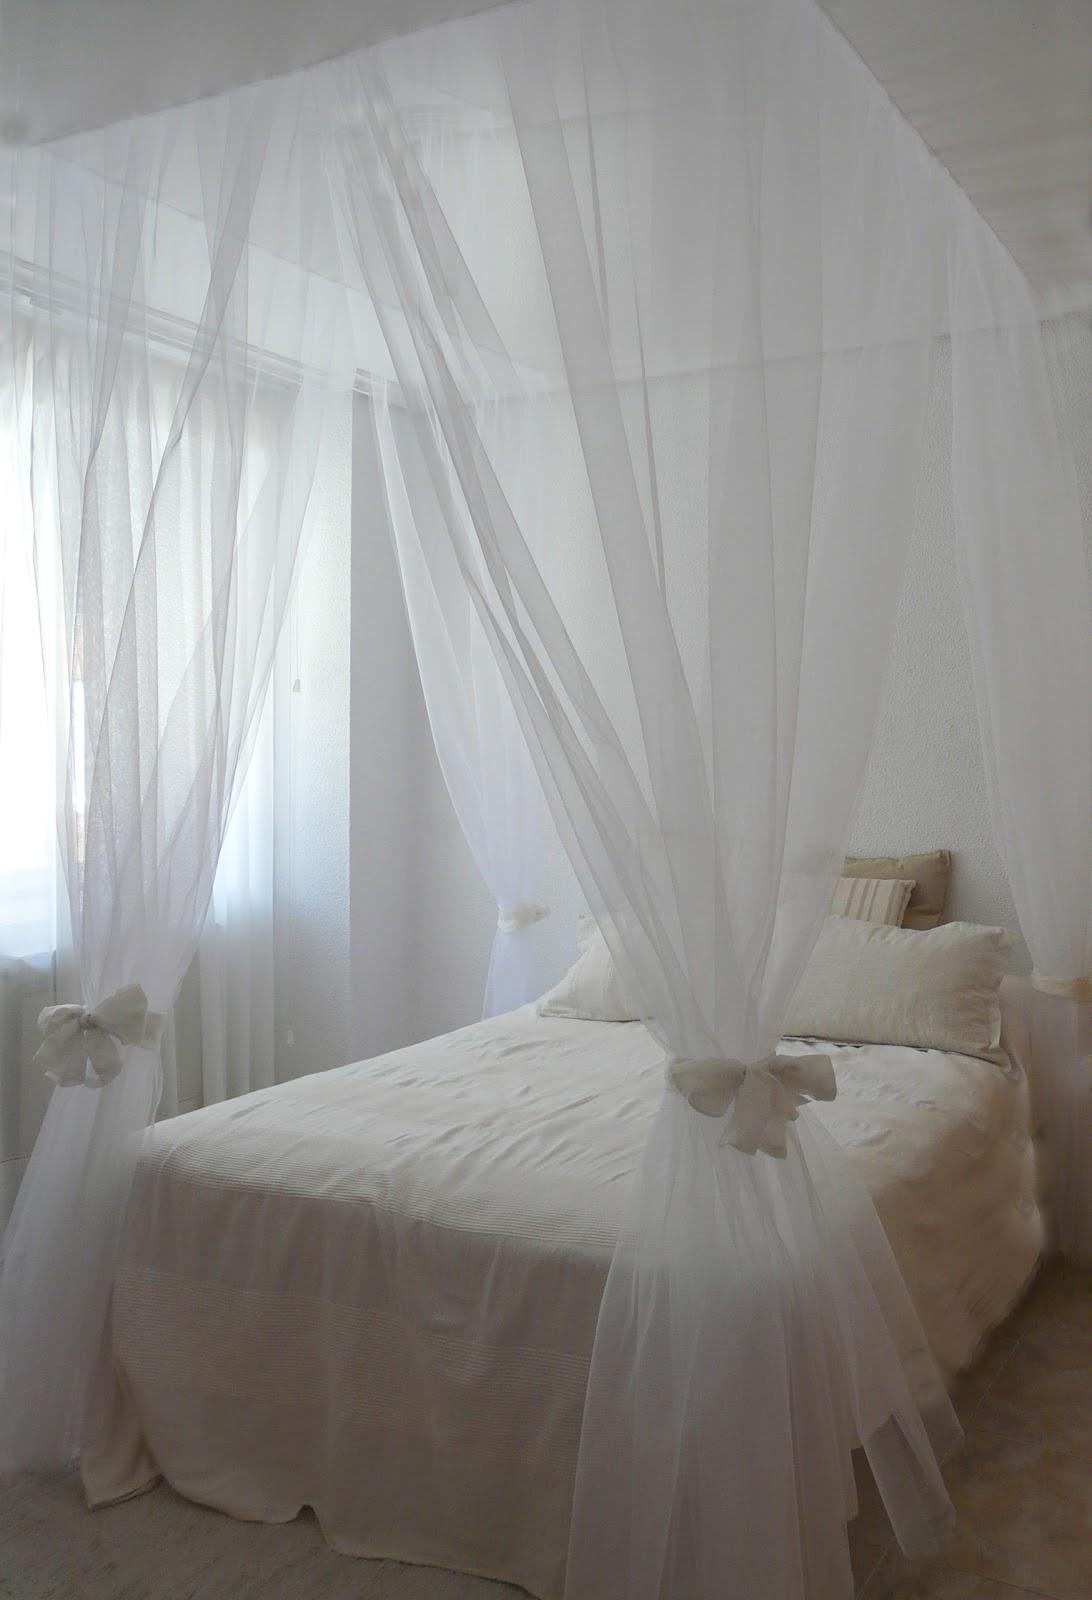 Trazoatrazo cama dosel - Dosel para cama ...